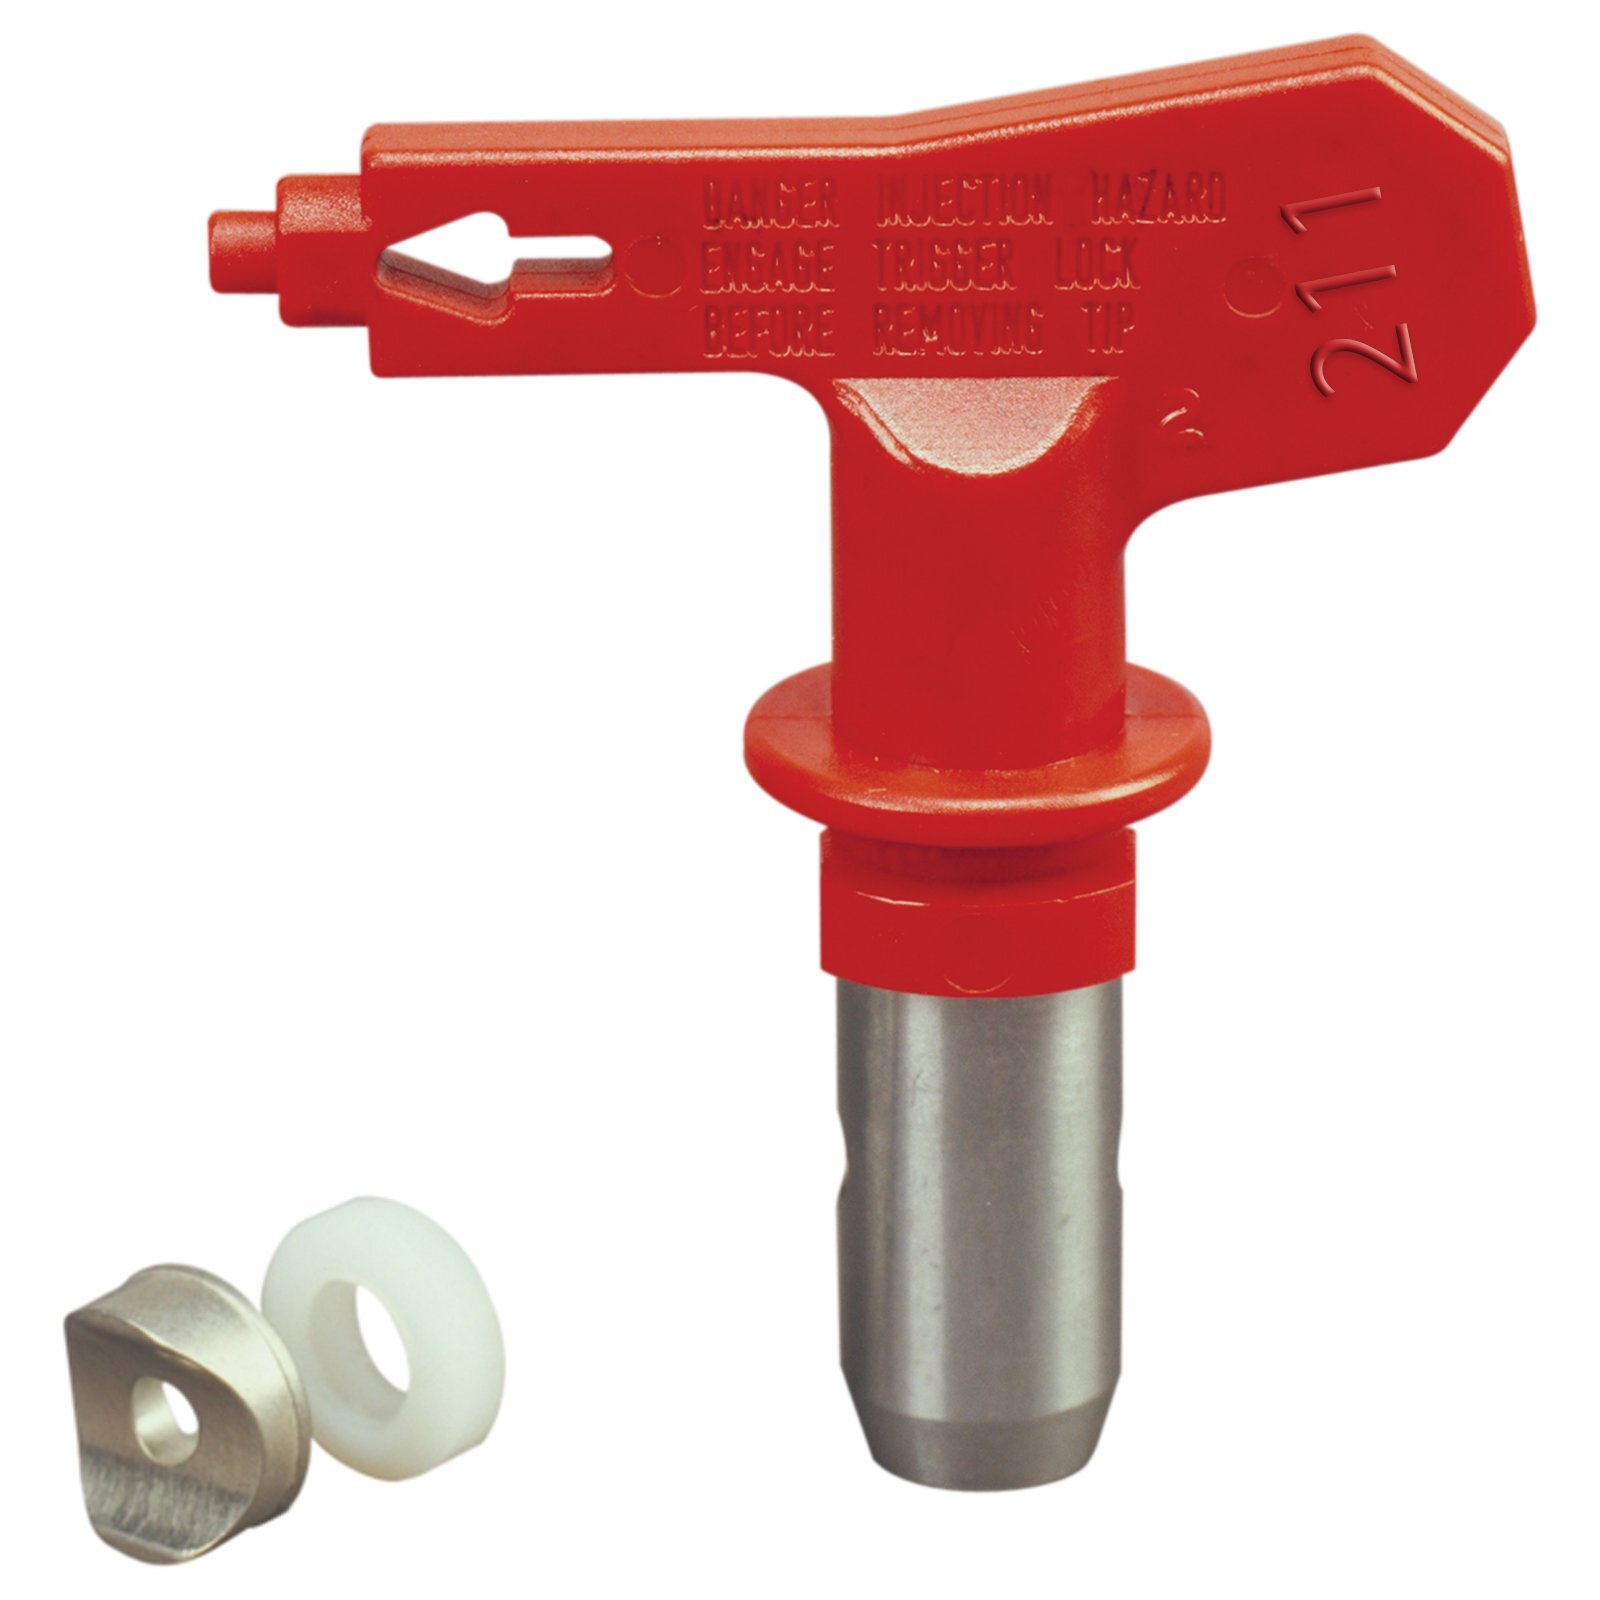 Titan SC6+ Standard 211 Spray Gun Tip